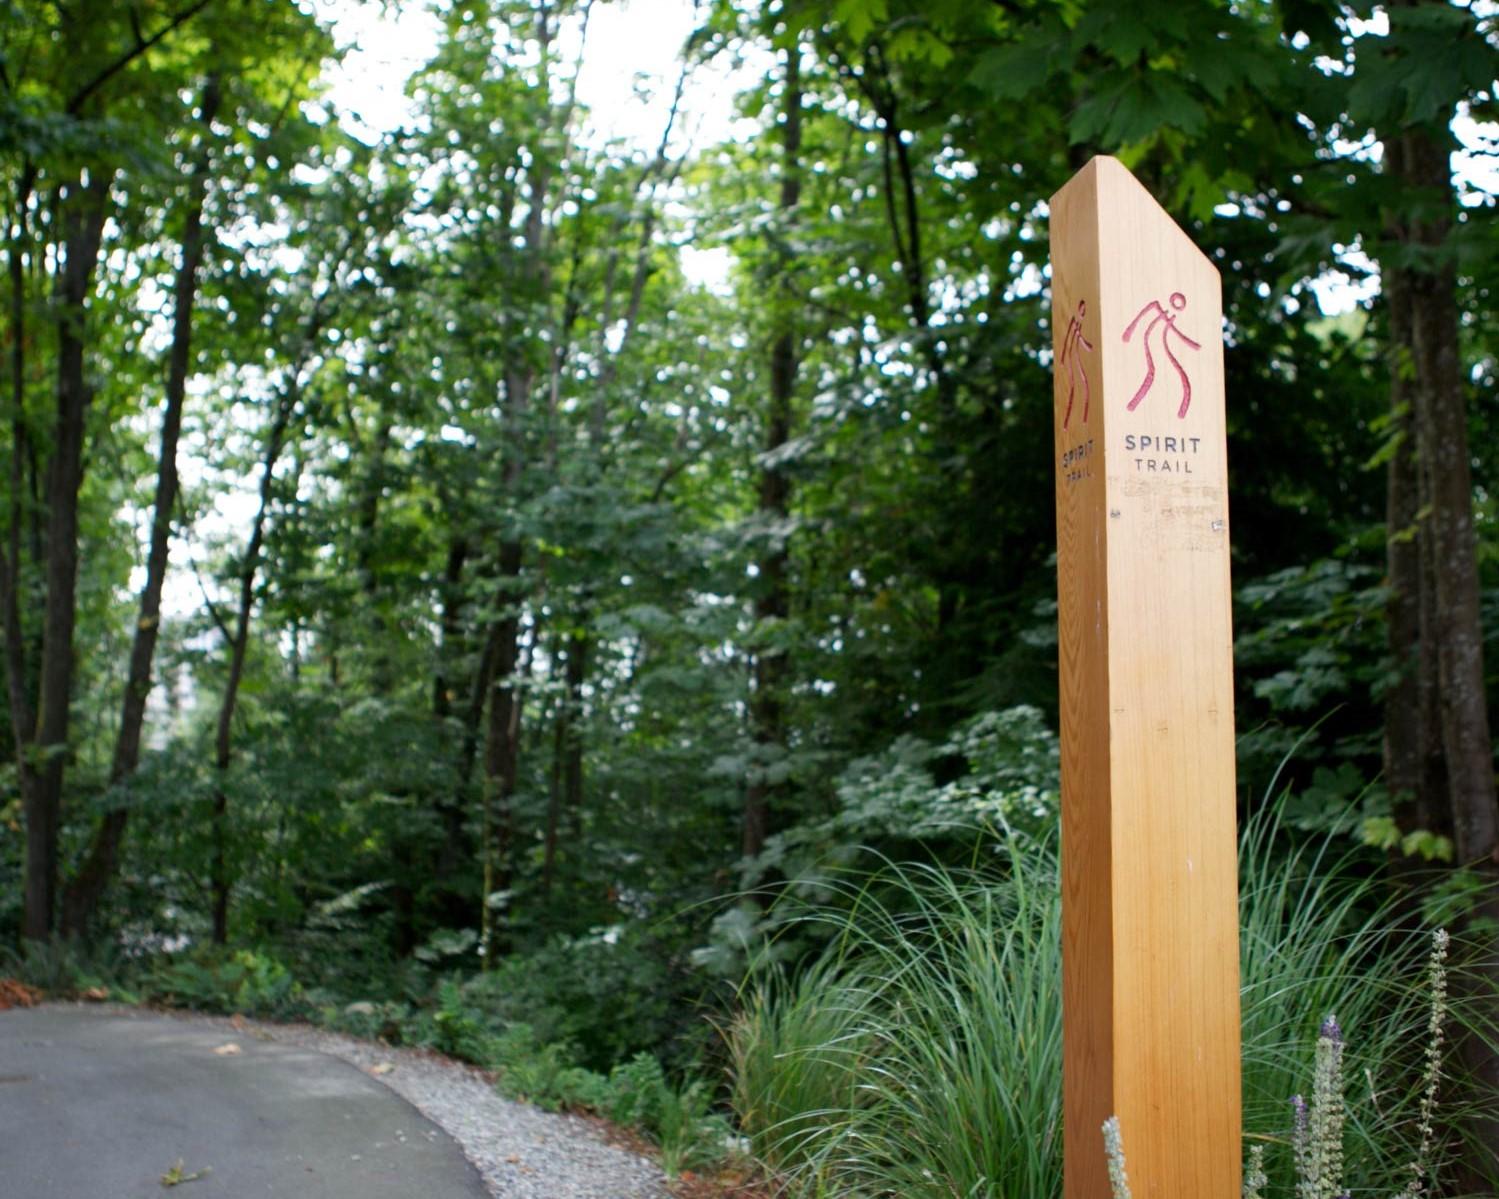 Spirit Trail Sign